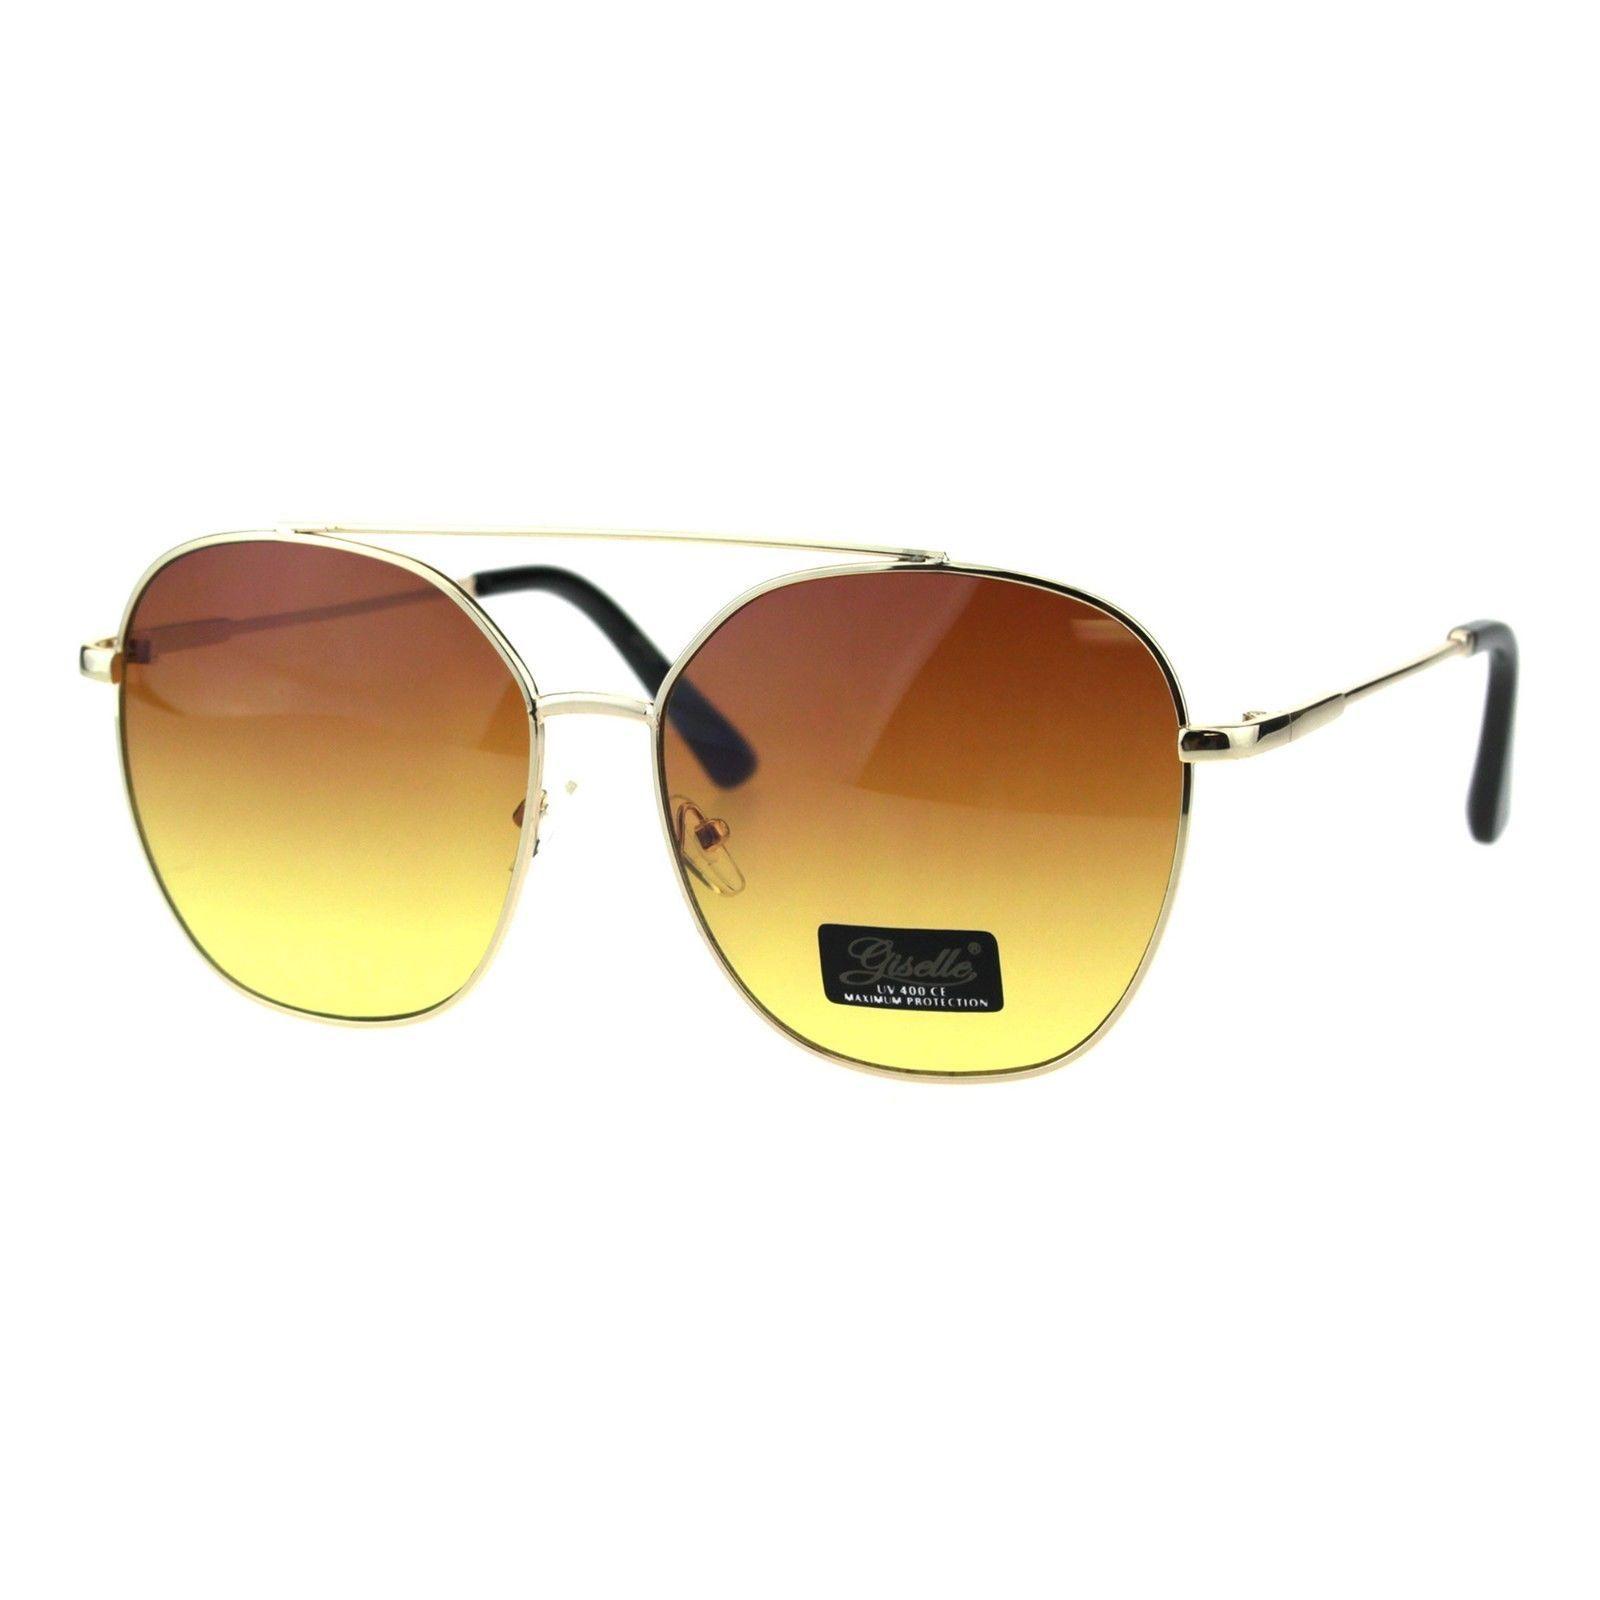 Womens Sunglasses Square Flat Top Bridge Fashion Aviators UV 400